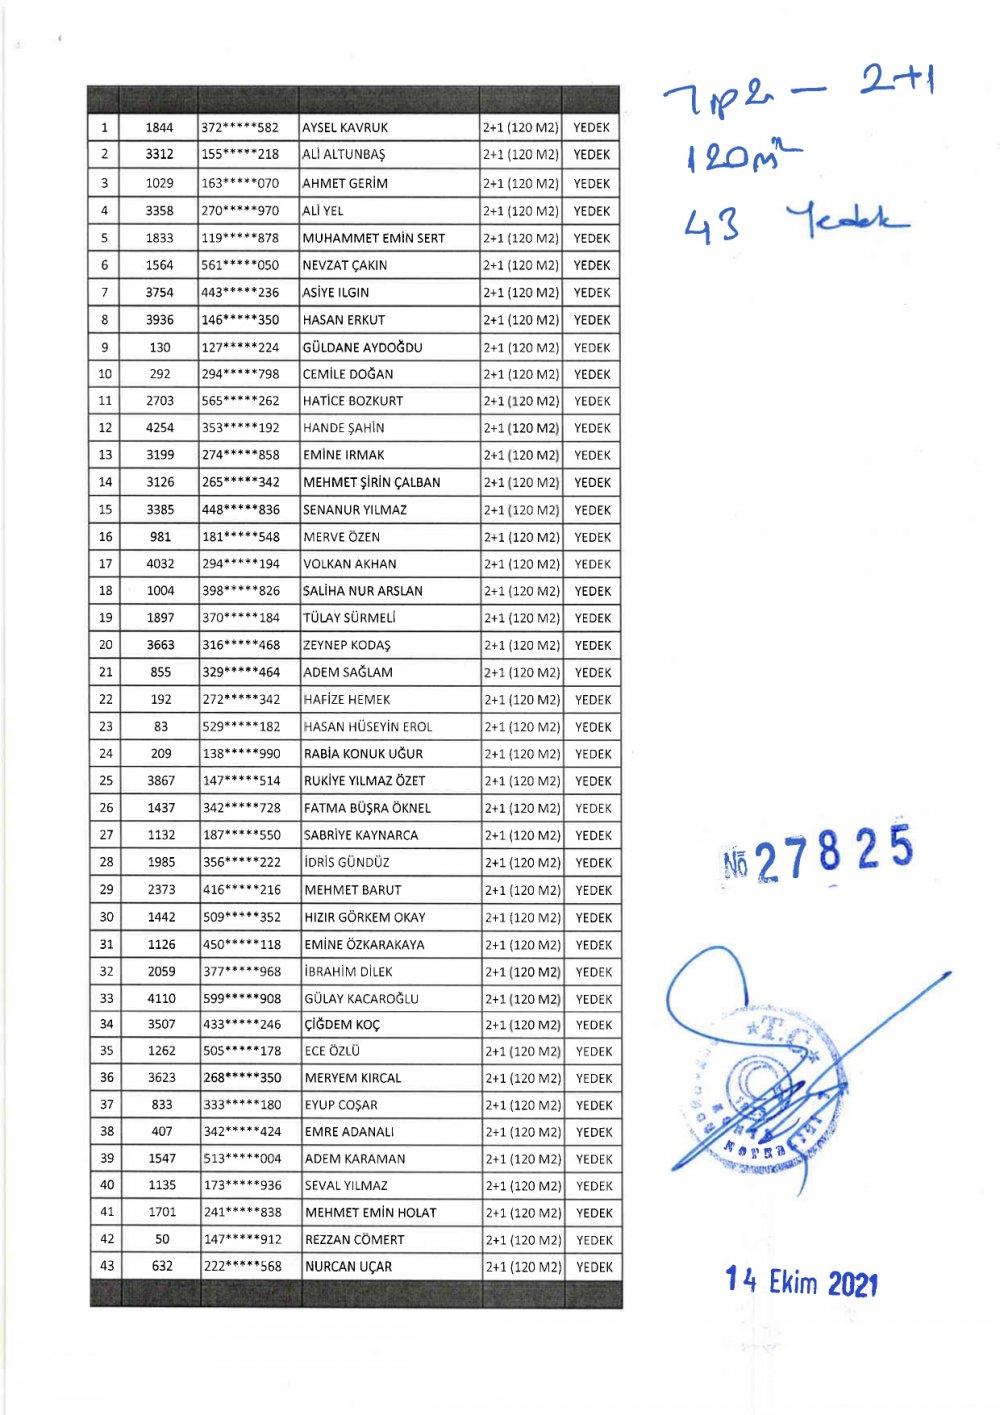 ss-turgutreis-evleri-kyk-kura-cekilis-listesi-page-0005.jpg